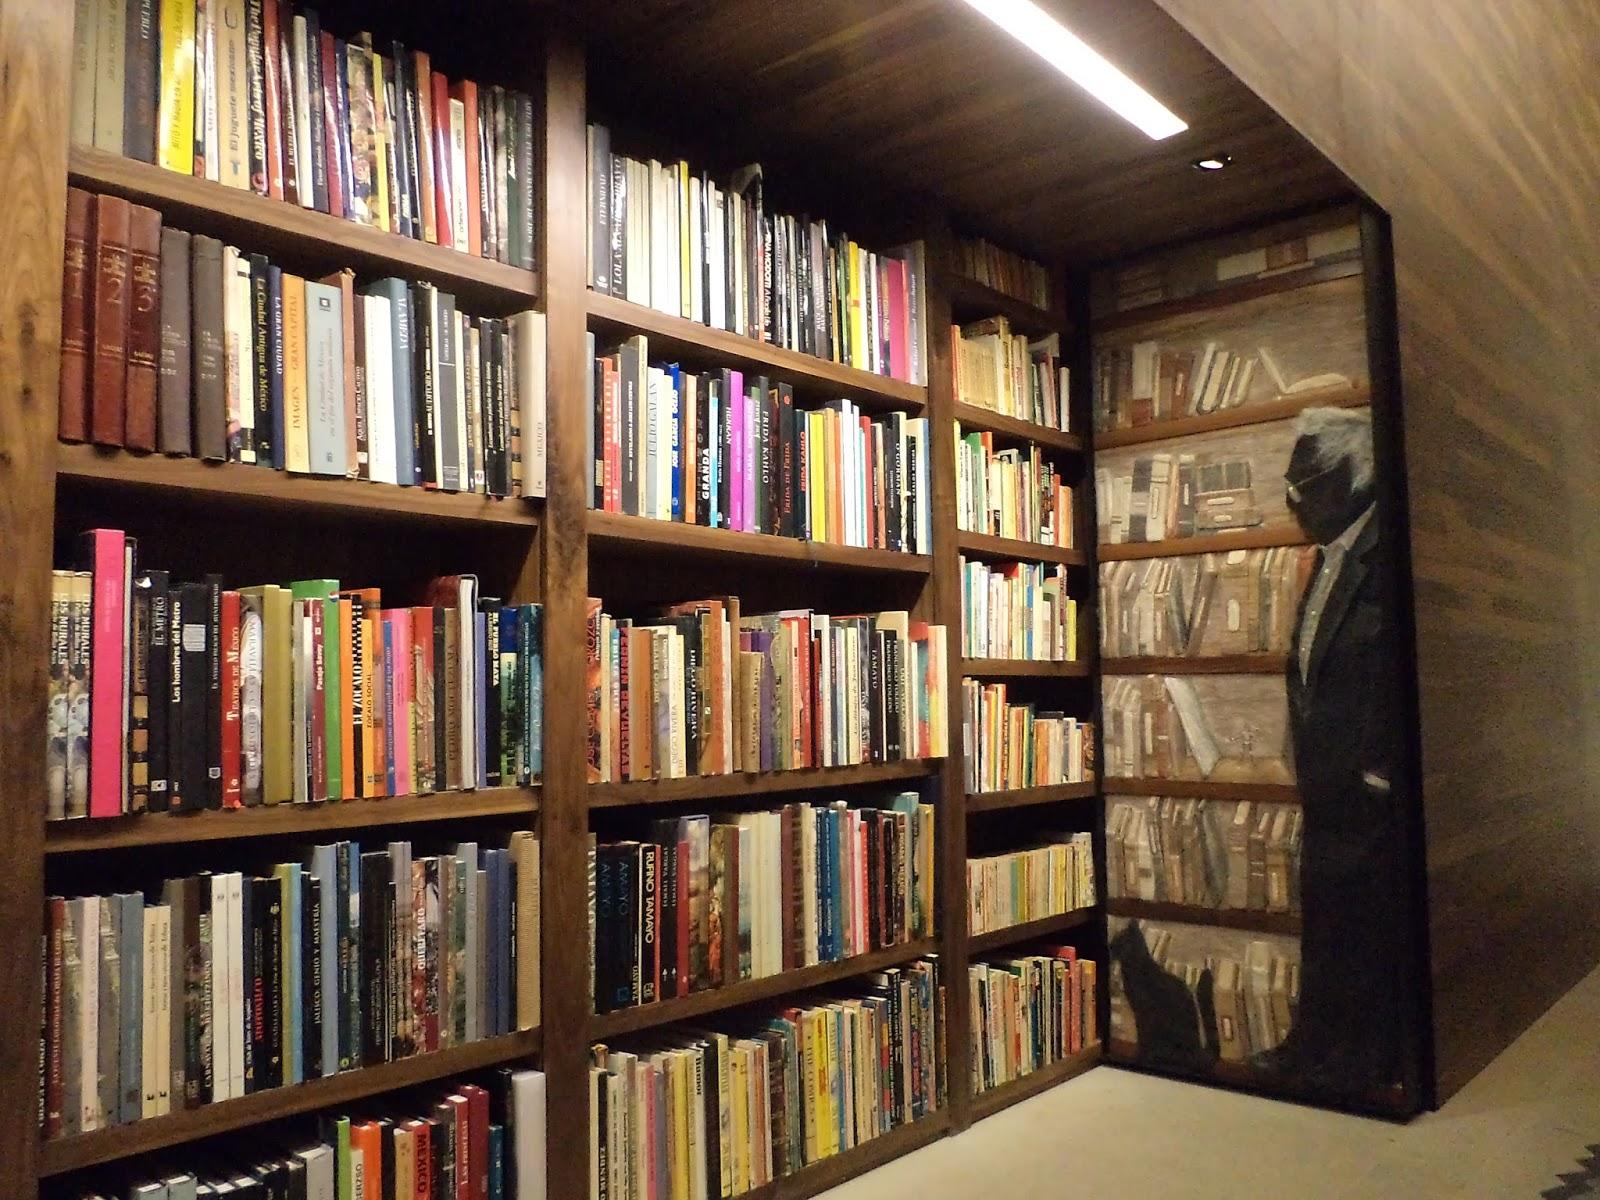 Interiores y 3d libreros modernos - Librerias de pared ...